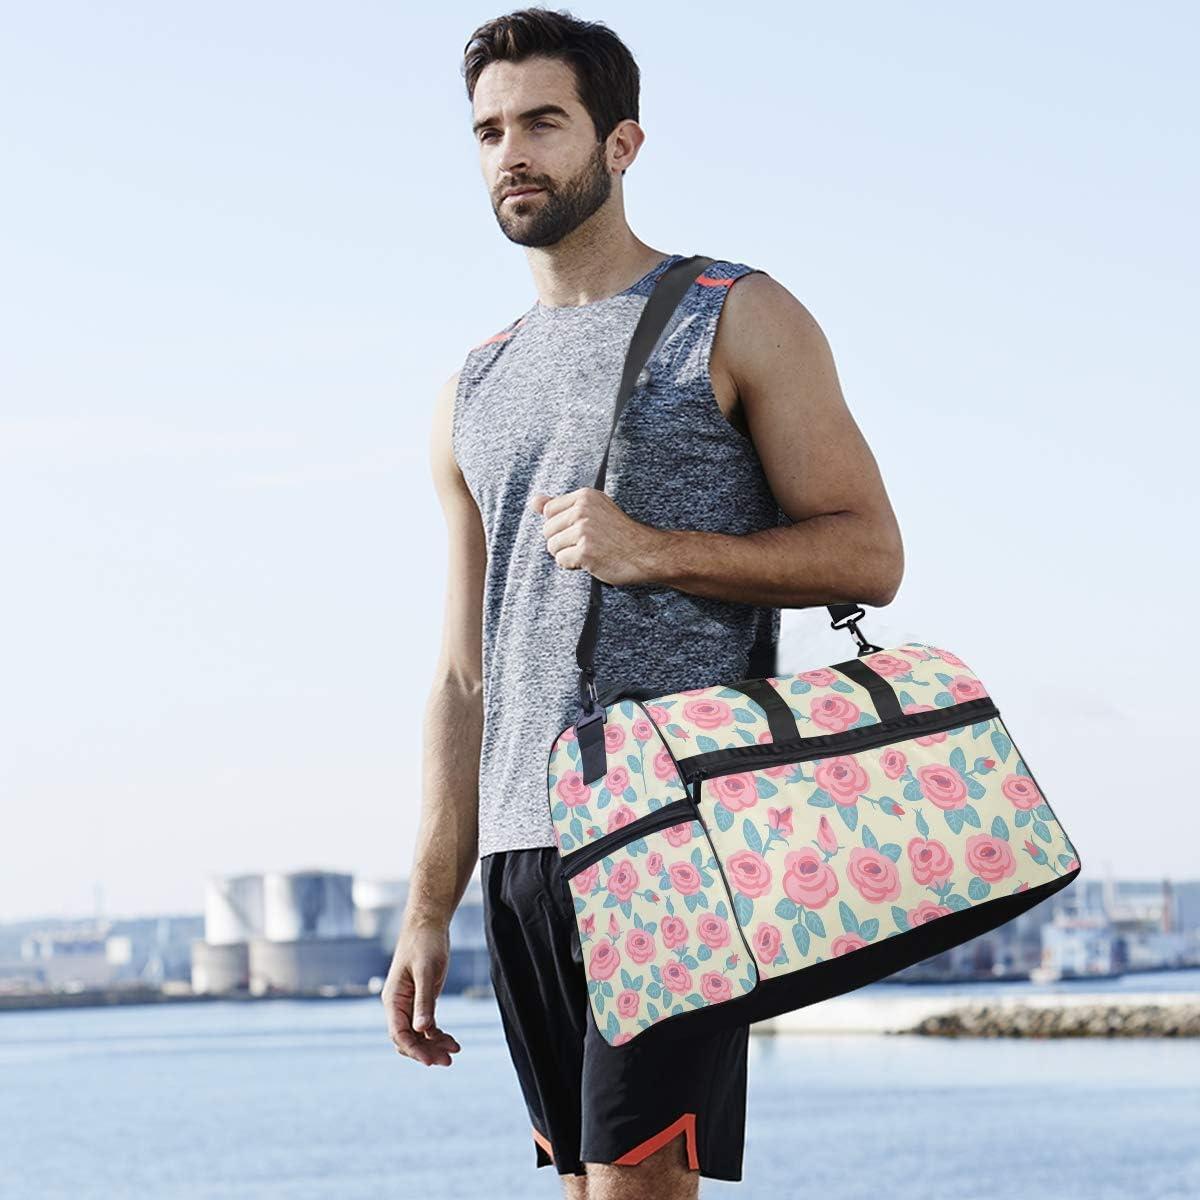 Travel Duffels Beautiful Rose Design Duffle Bag Luggage Sports Gym for Women /& Men